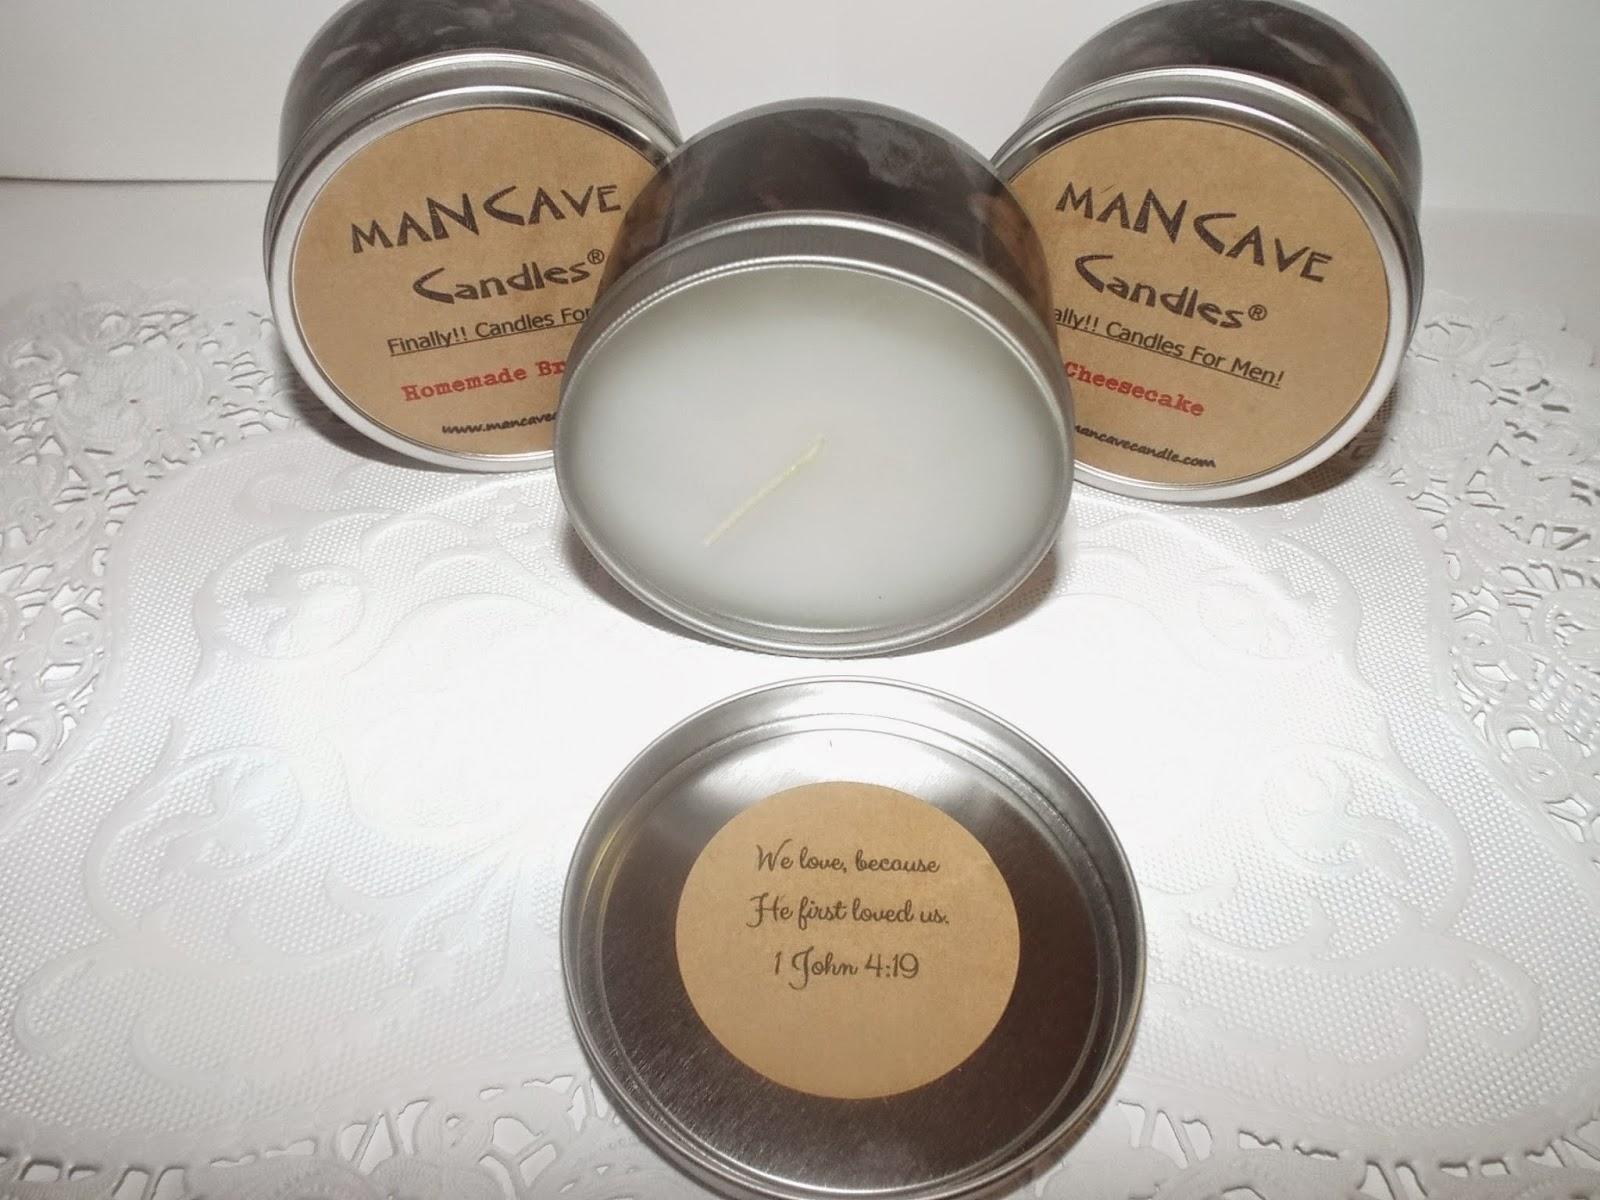 Mancave Candles Christiam